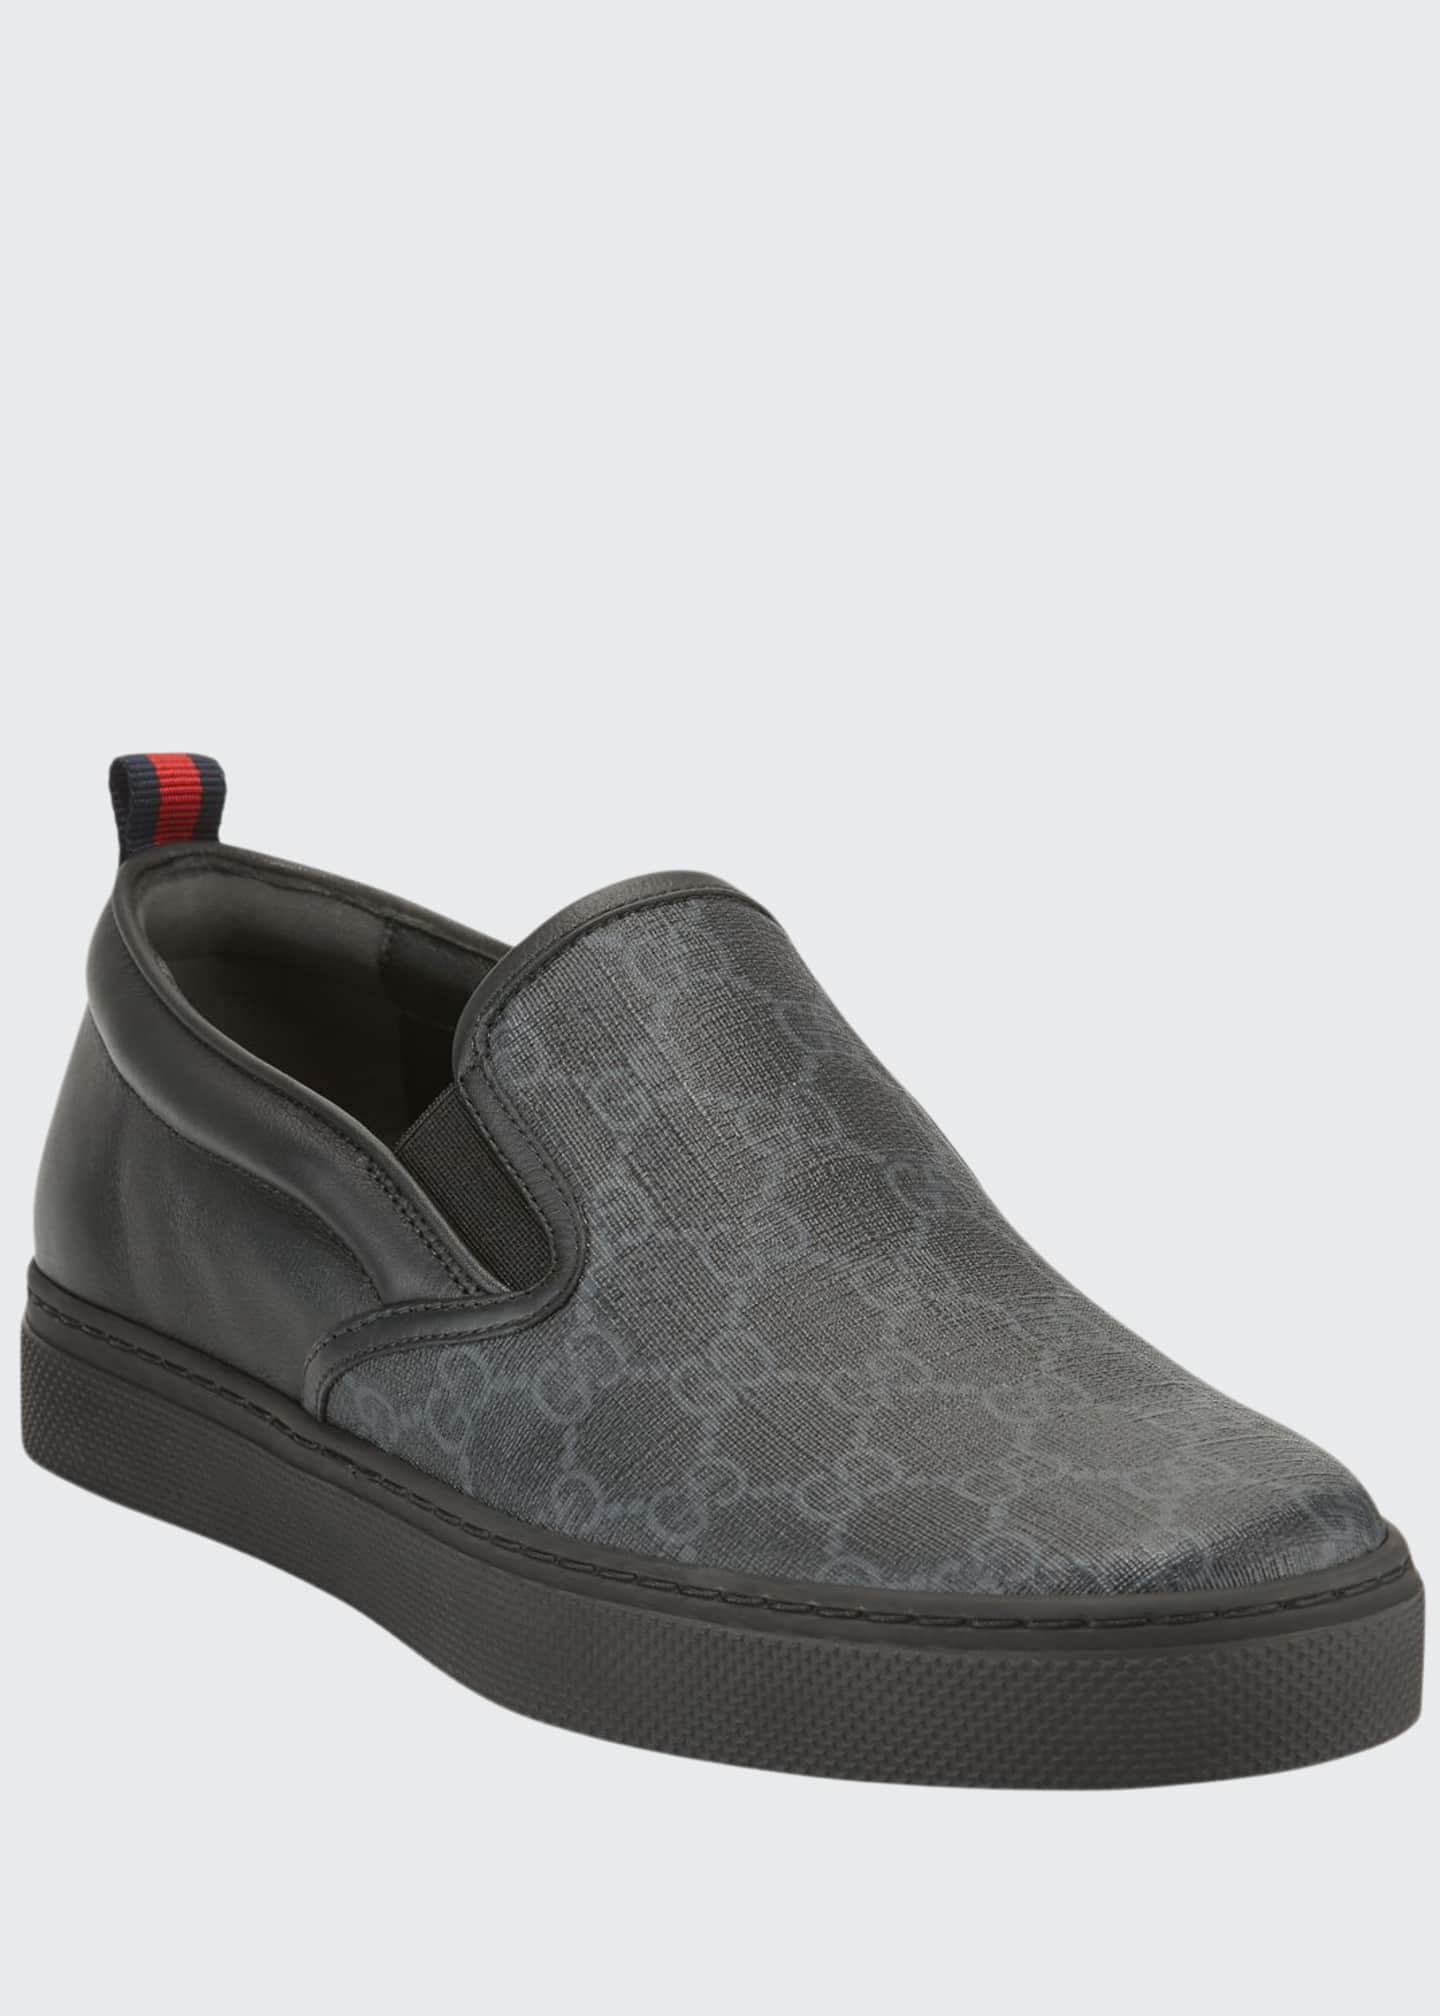 Gucci Men's Dublin Logo Slip-On Sneakers